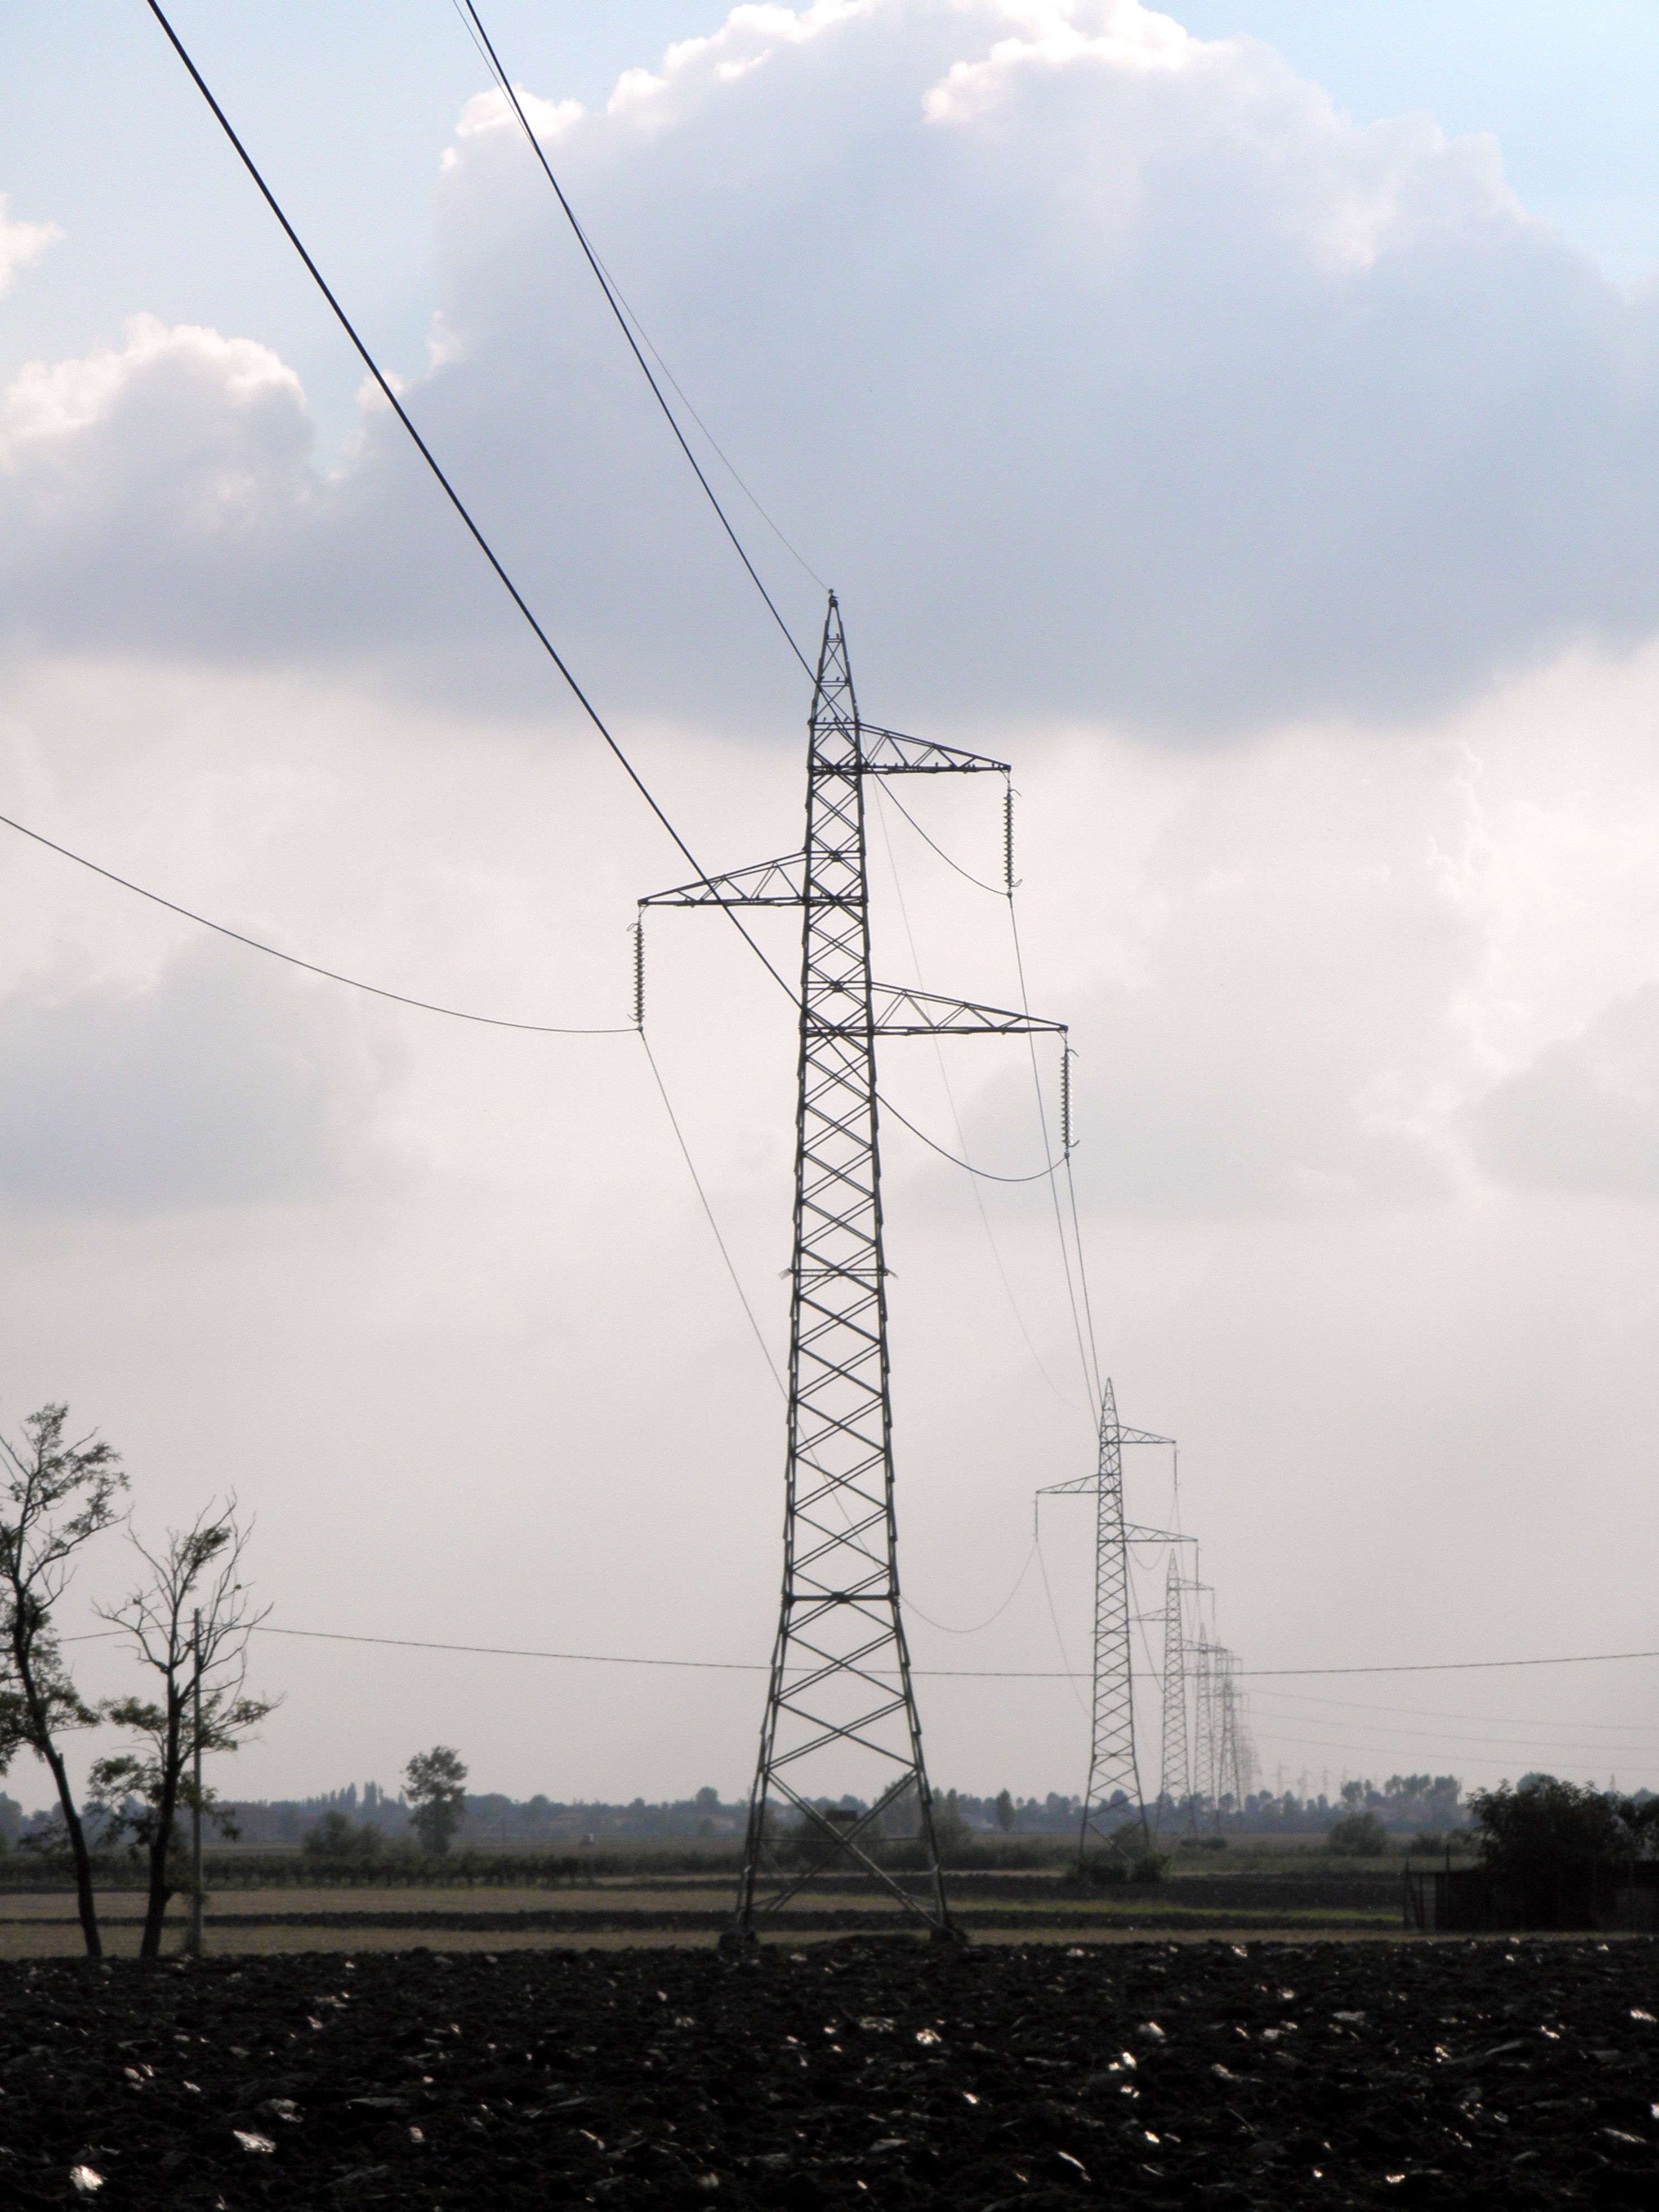 High Voltage Power Lines : File high voltage overhead power line in mardimago g